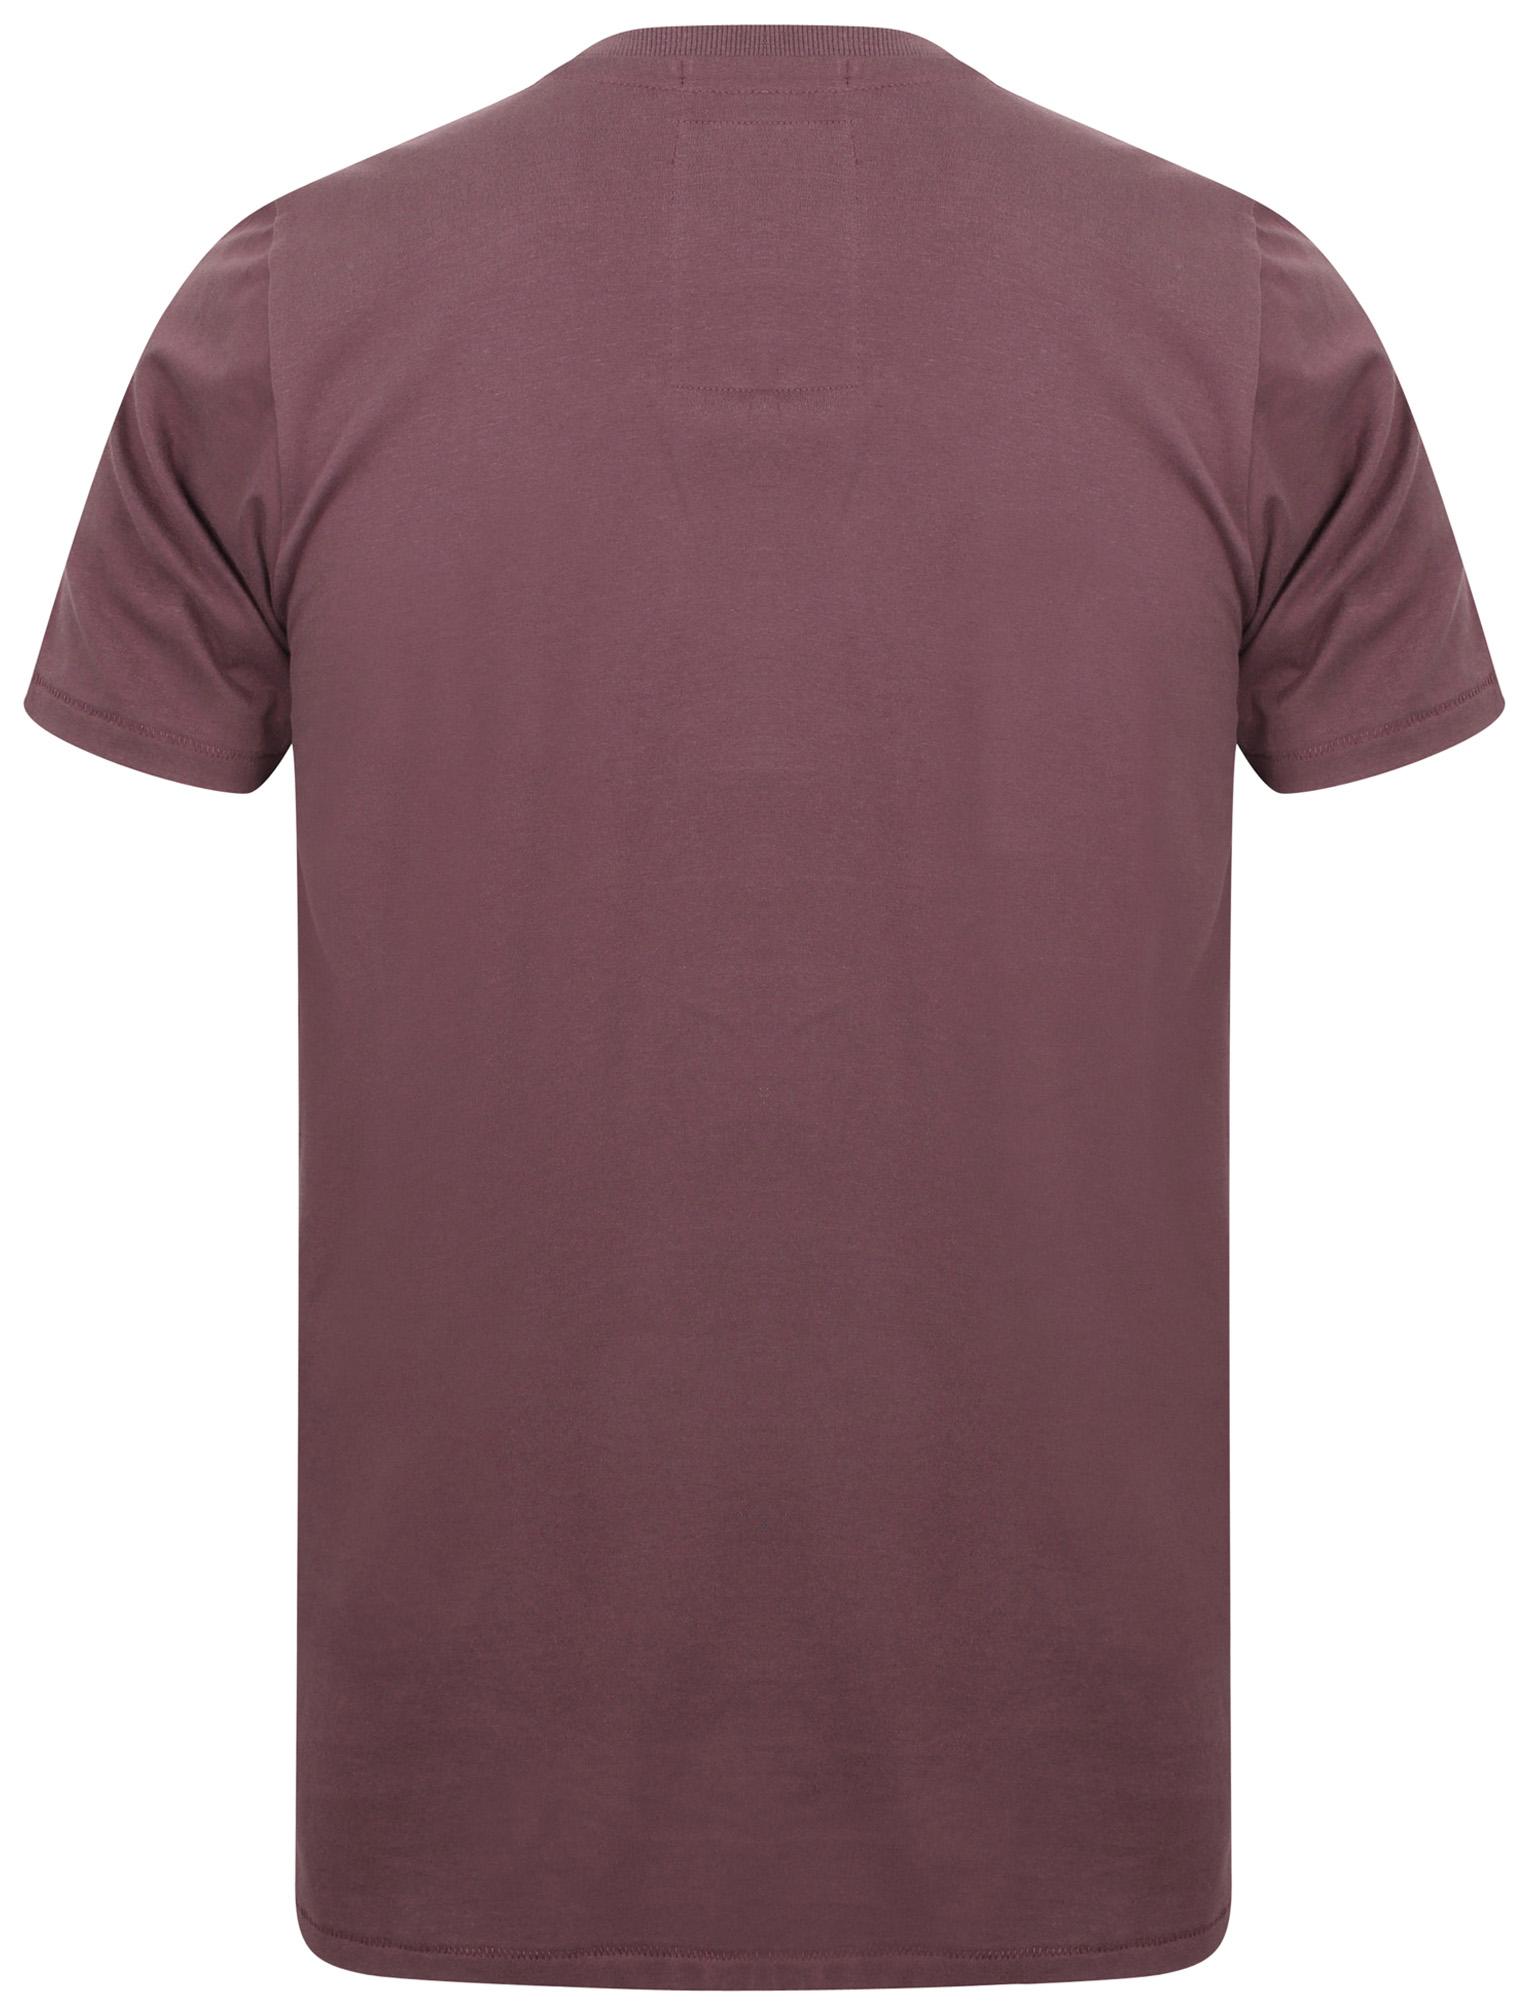 New-Mens-Tokyo-Laundry-Branded-Ellsworth-Crew-Neck-Cotton-Rich-T-shirt-Size-S-XL thumbnail 7